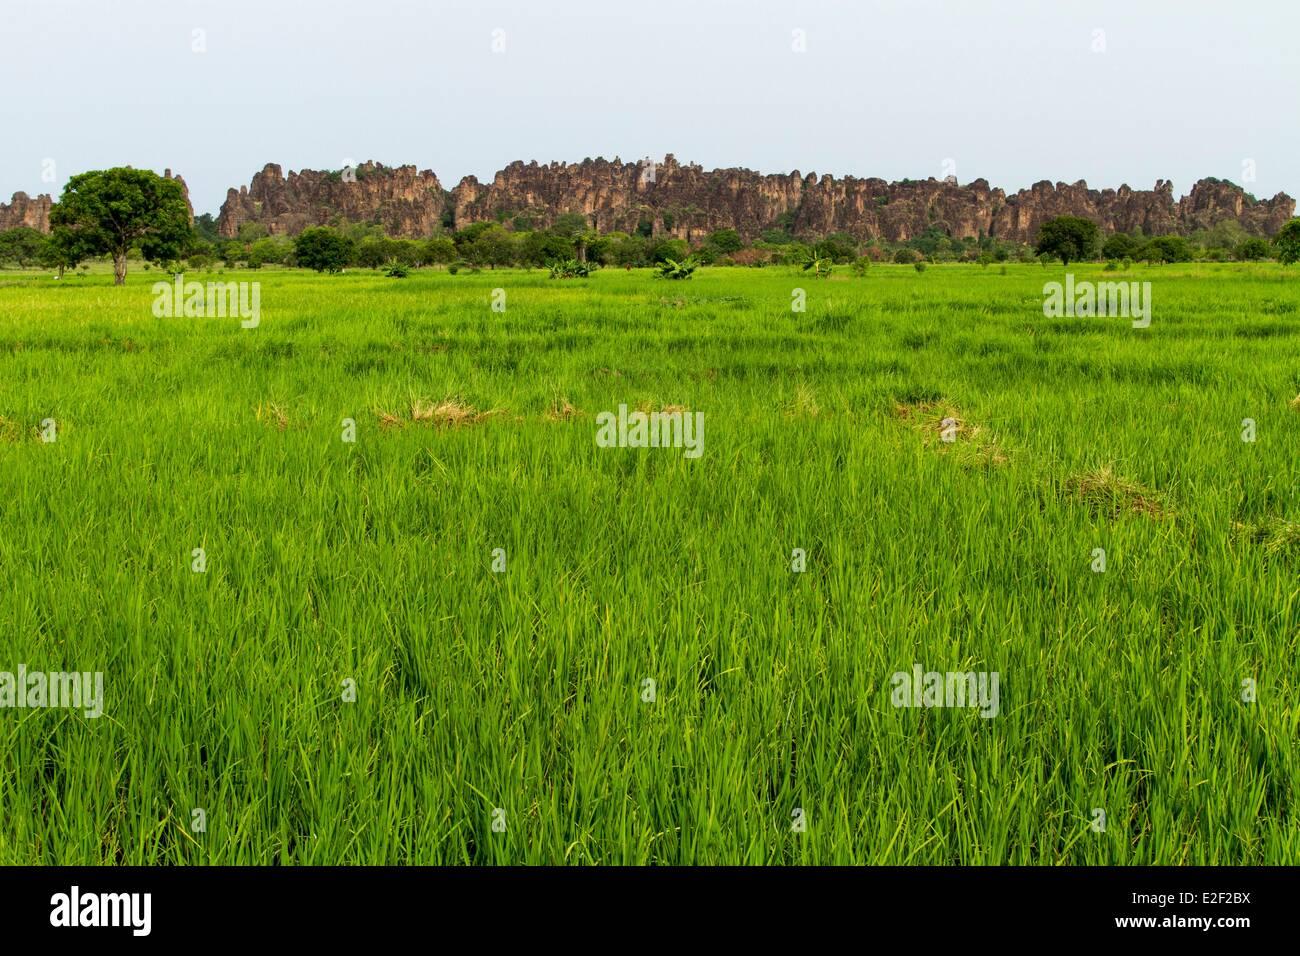 Le Burkina Faso, région sénoufo, pics de Sindou Photo Stock